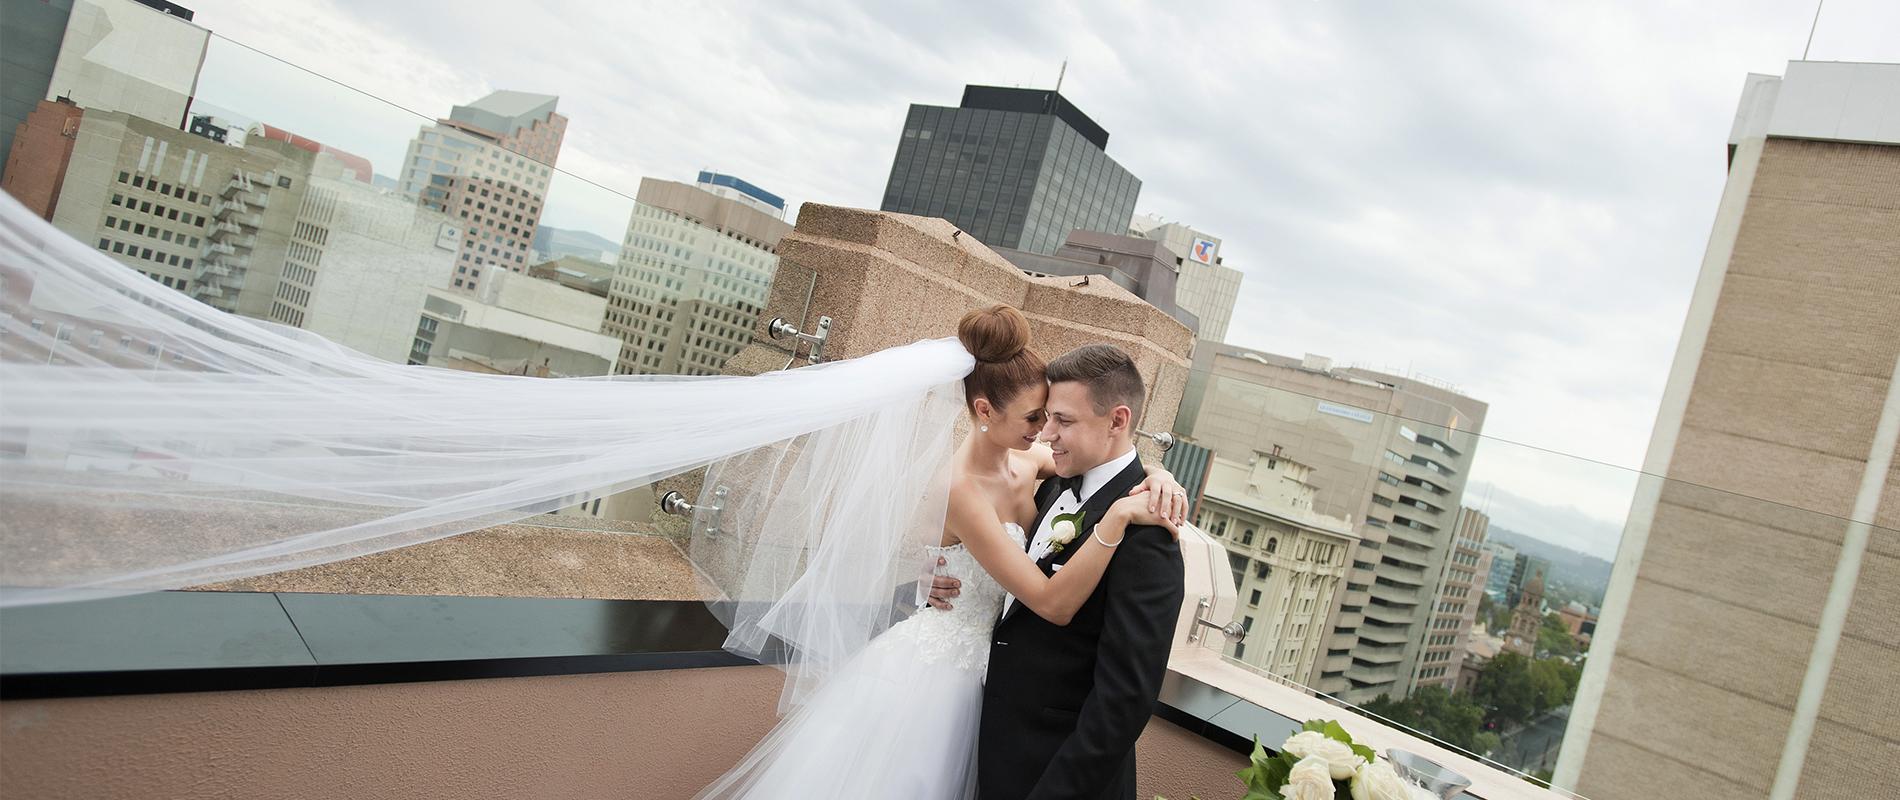 Adelaide Wedding Photographer - Belle Photo